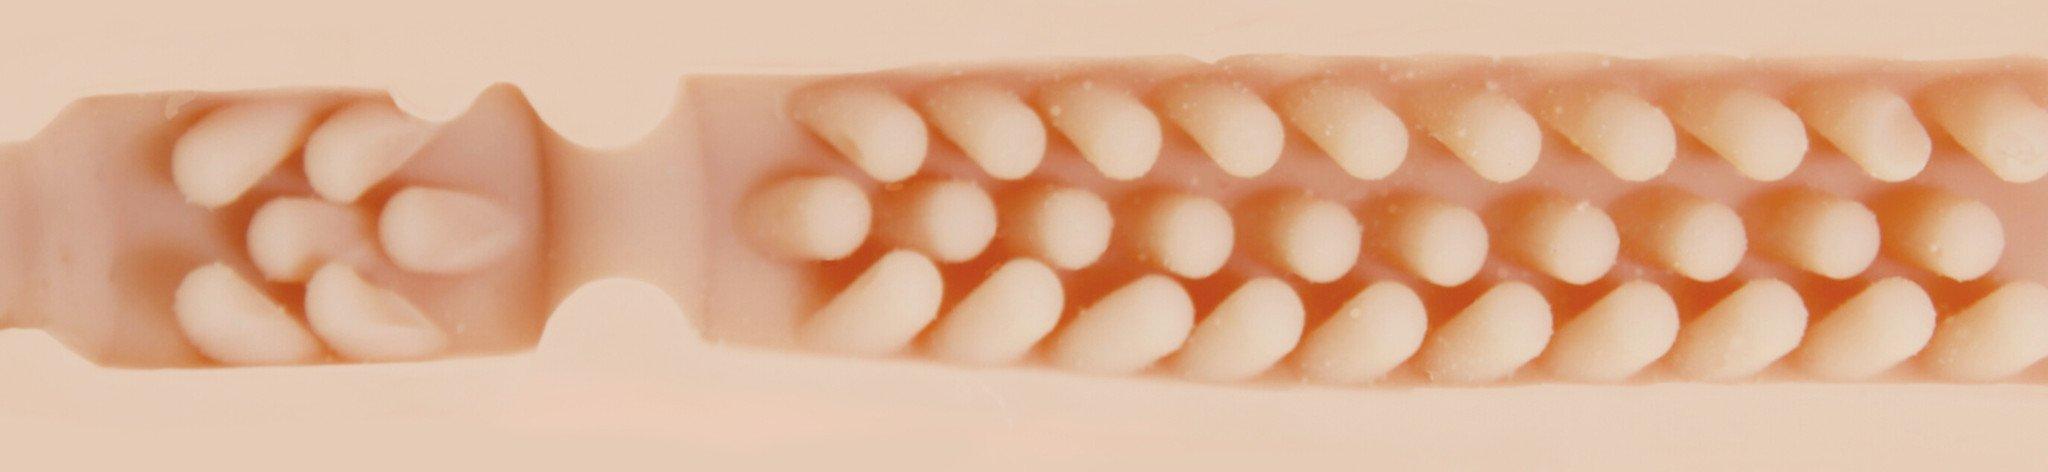 Barracuda Texture Image